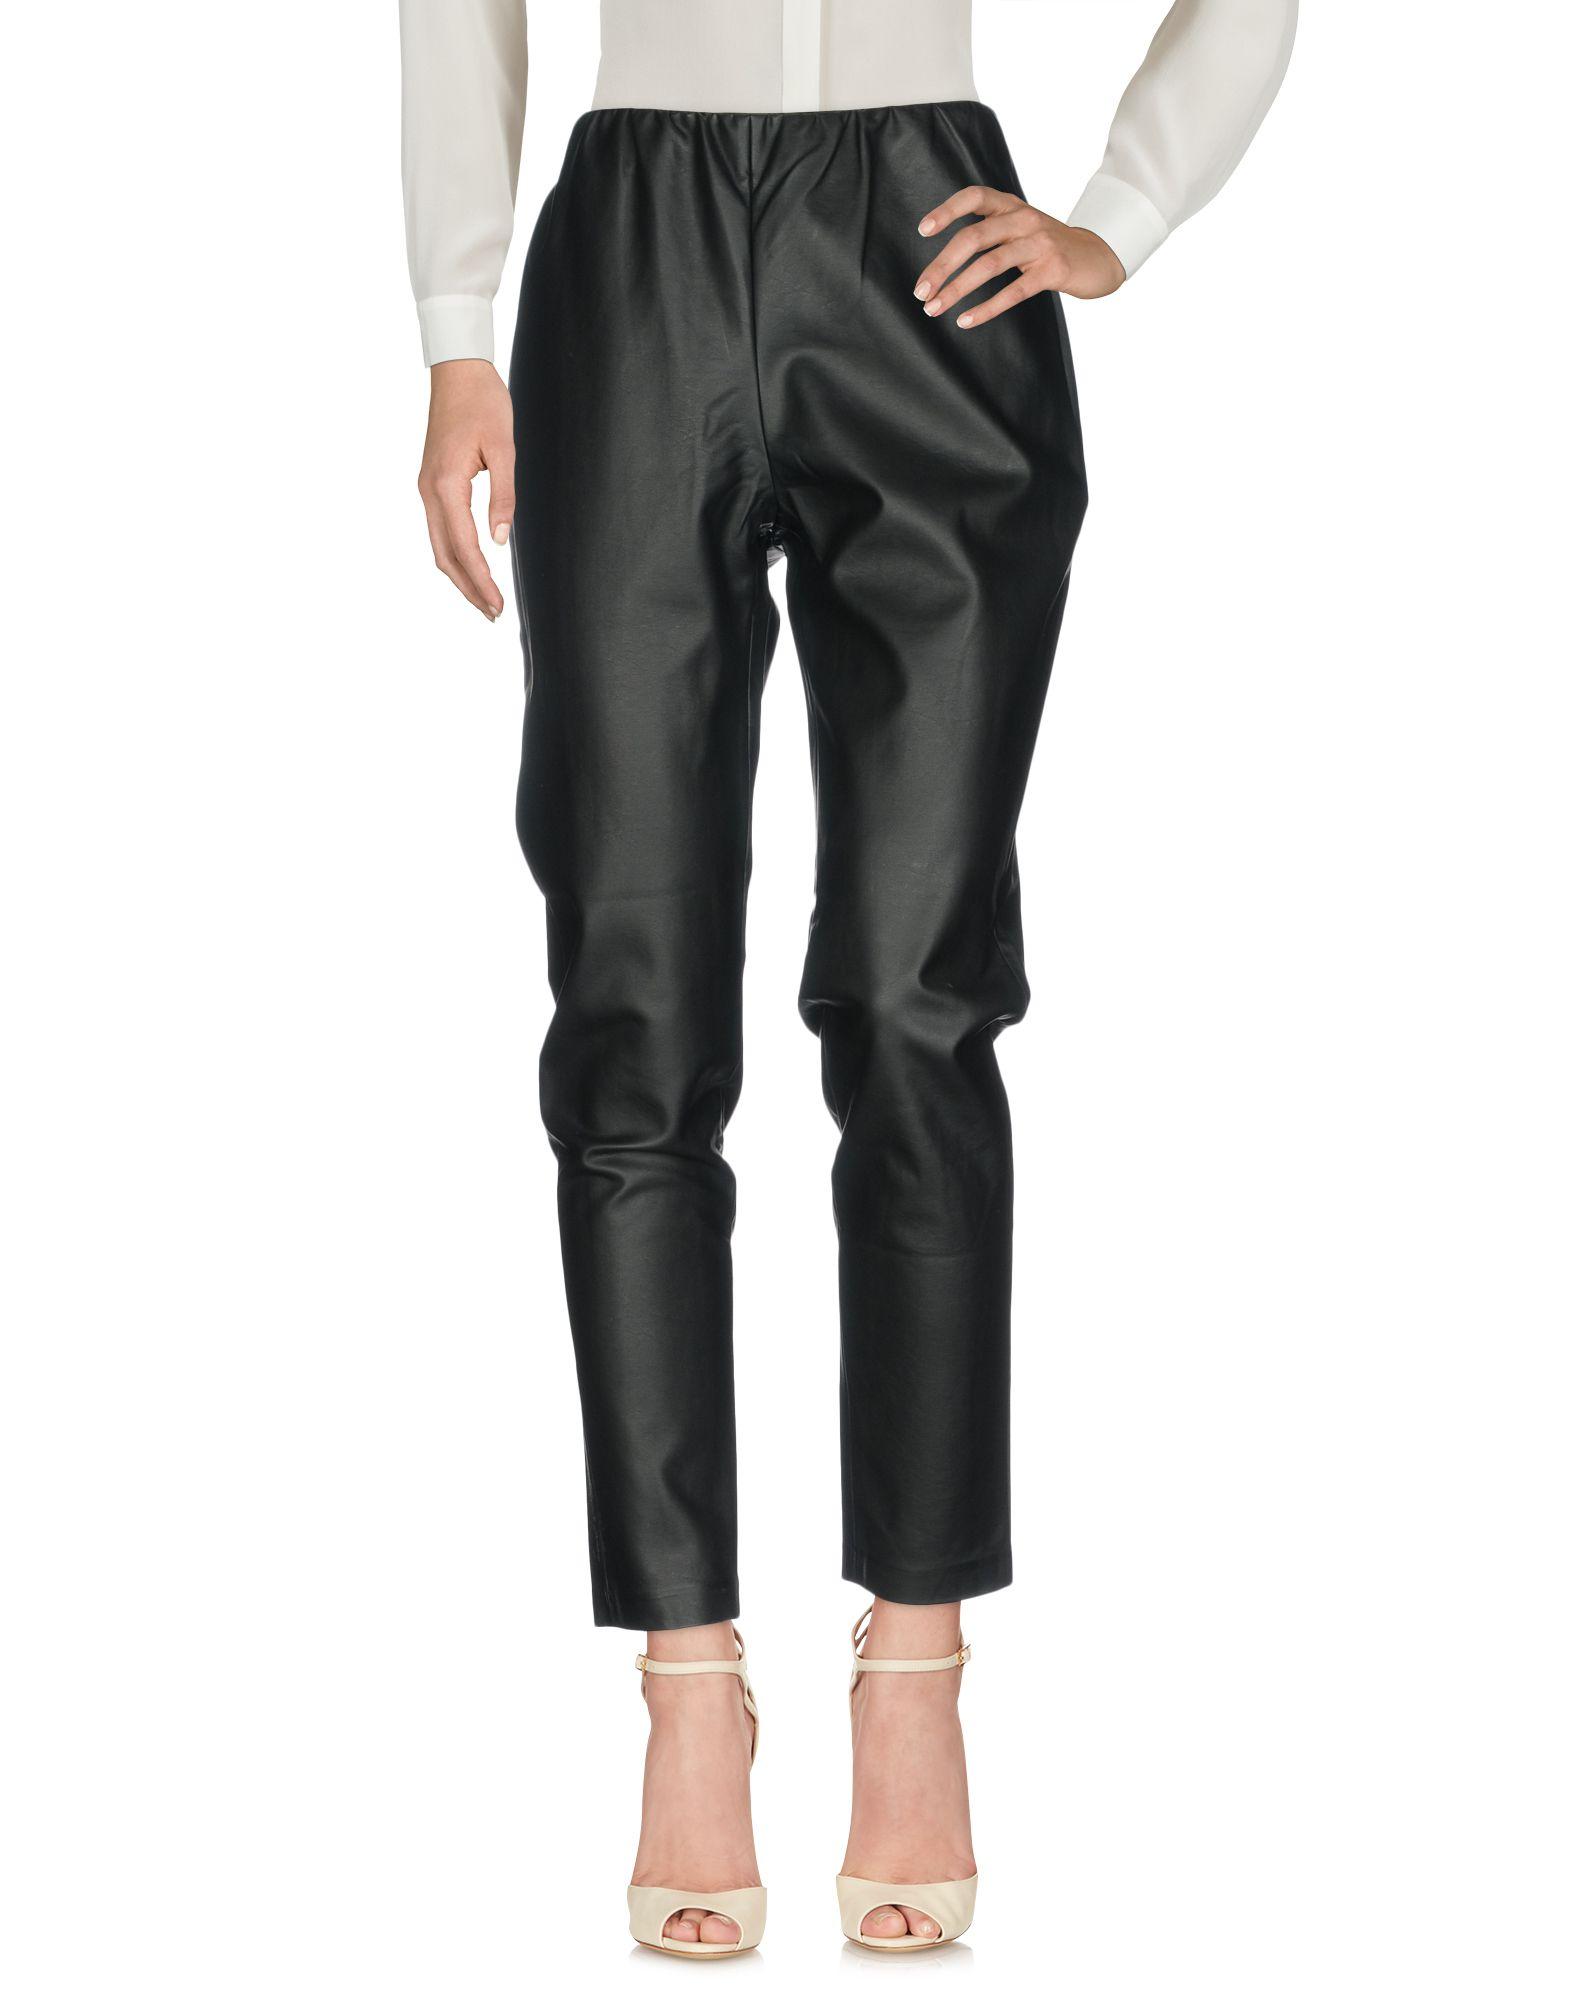 JIJIL Casual Pants in Black